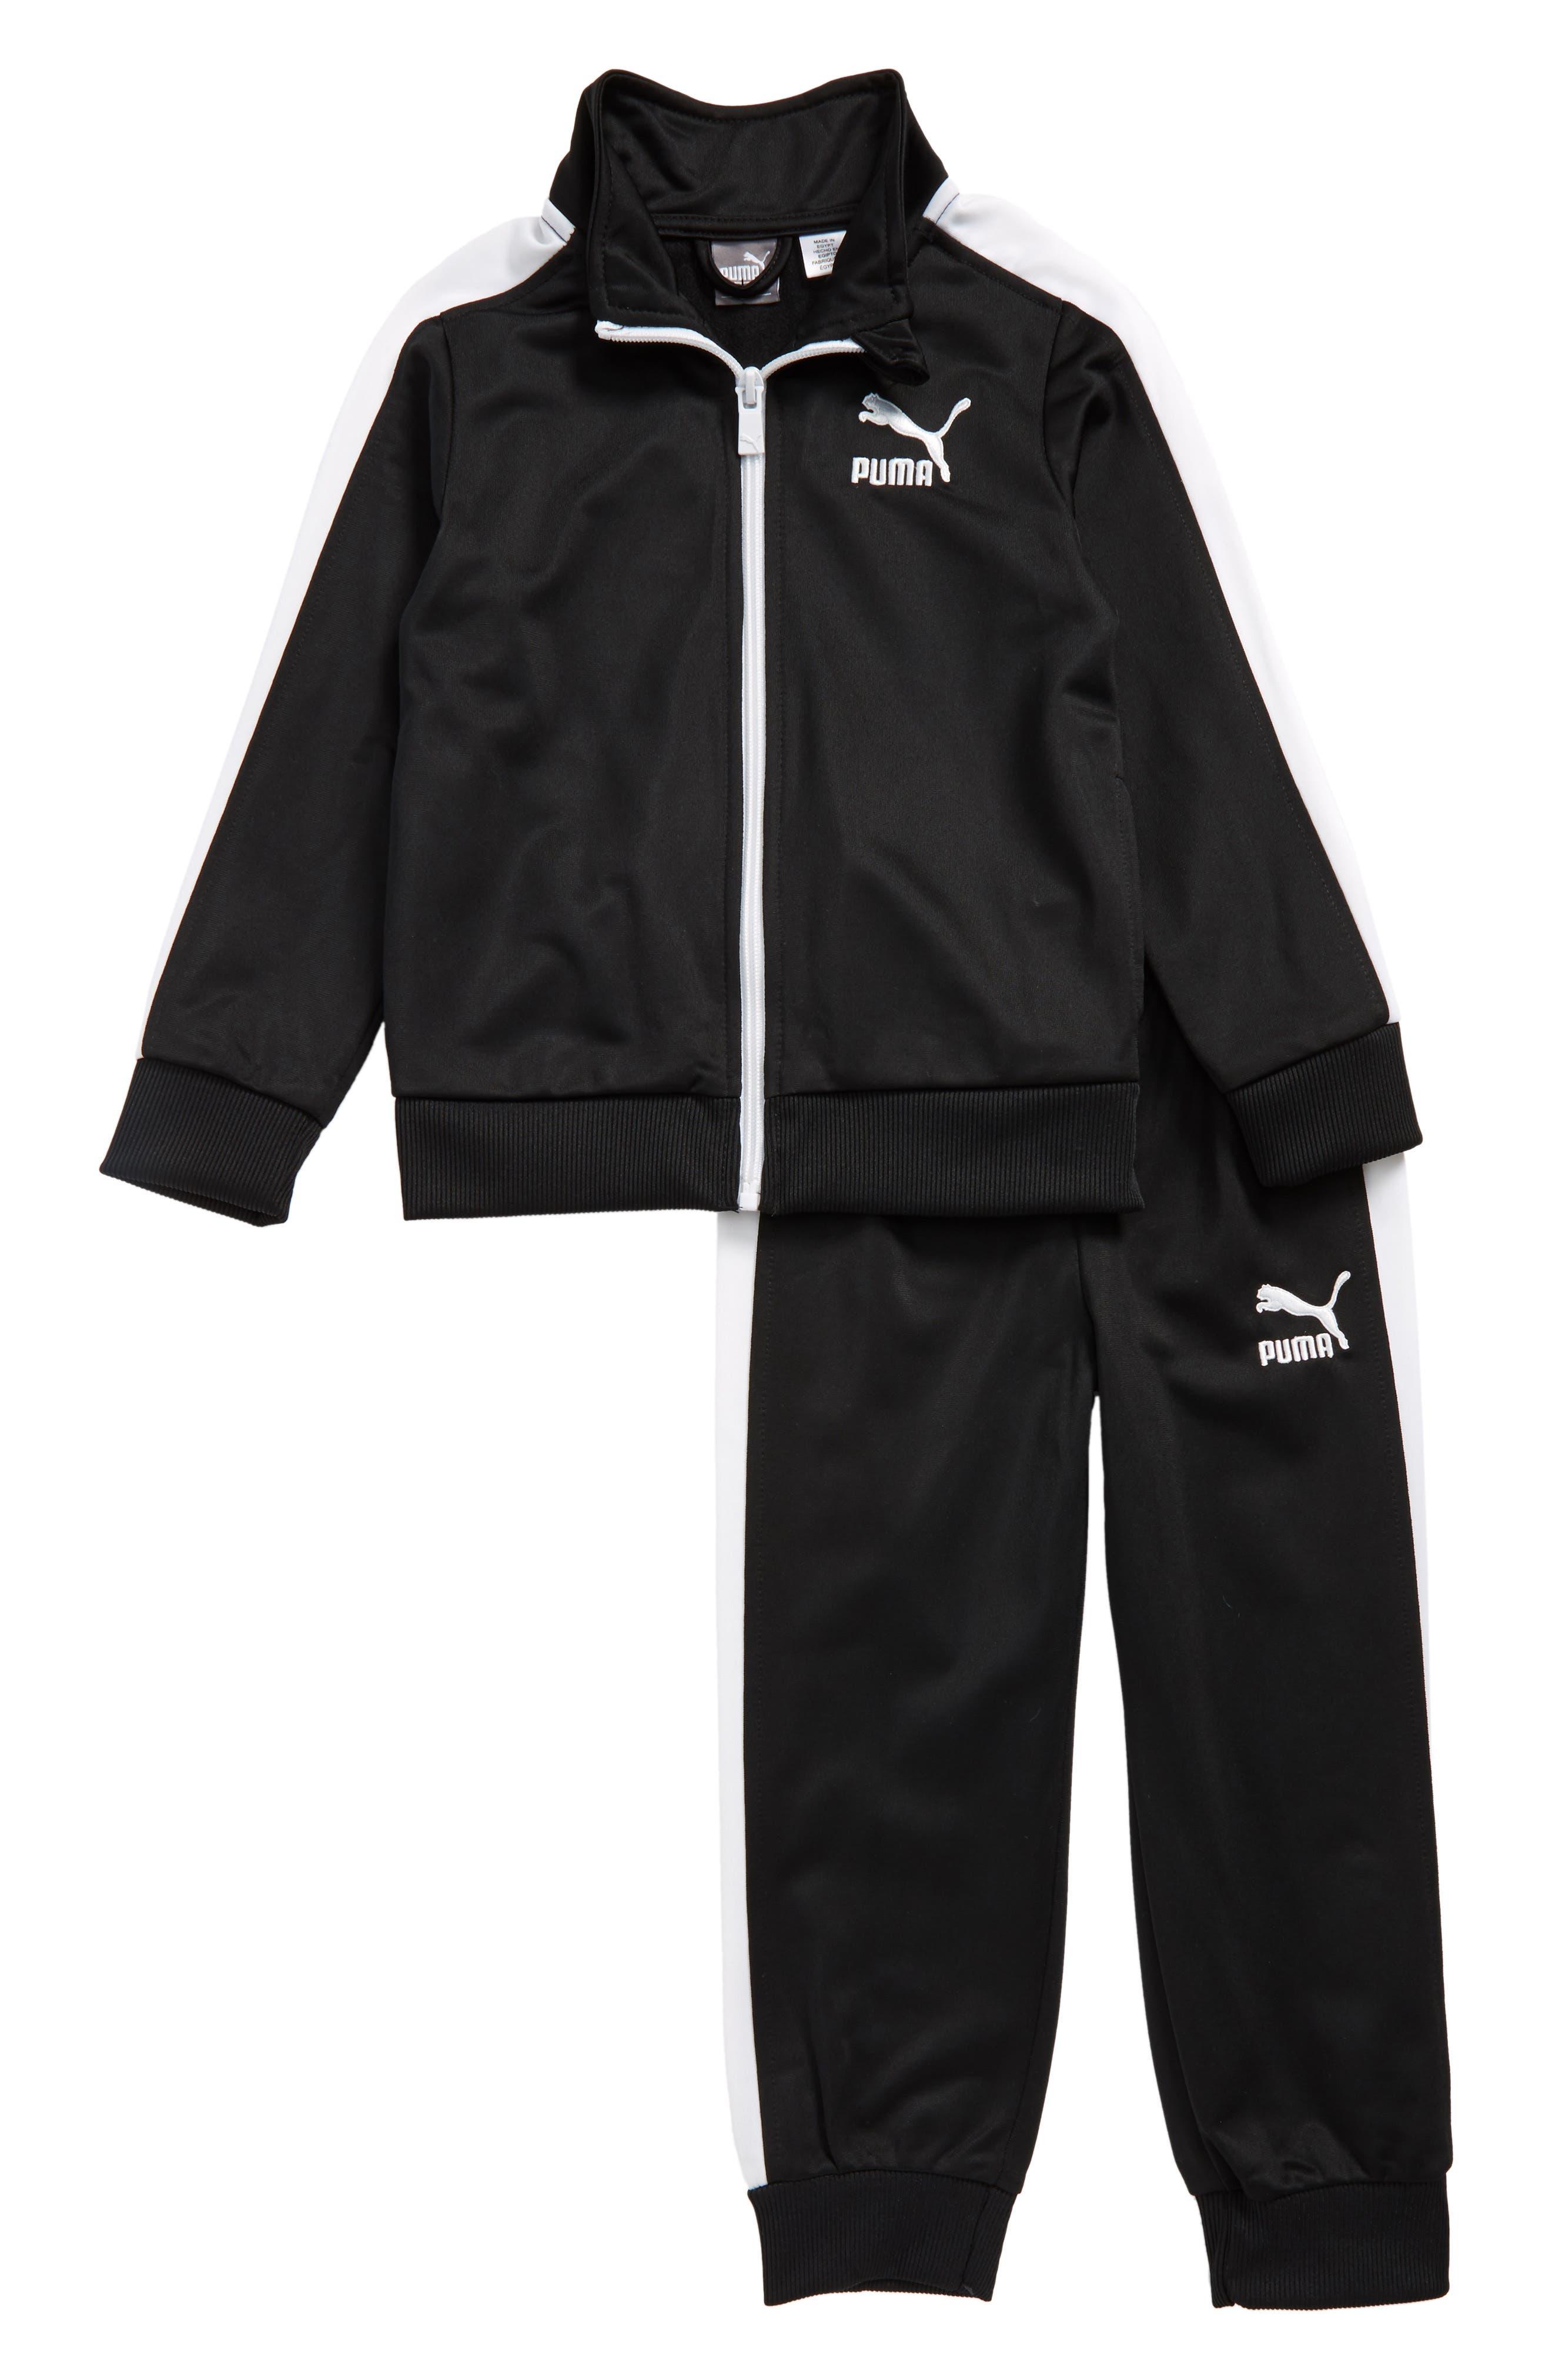 Main Image - PUMA Jacket & Sweatpants Set (Toddler Boys & Little Boys)